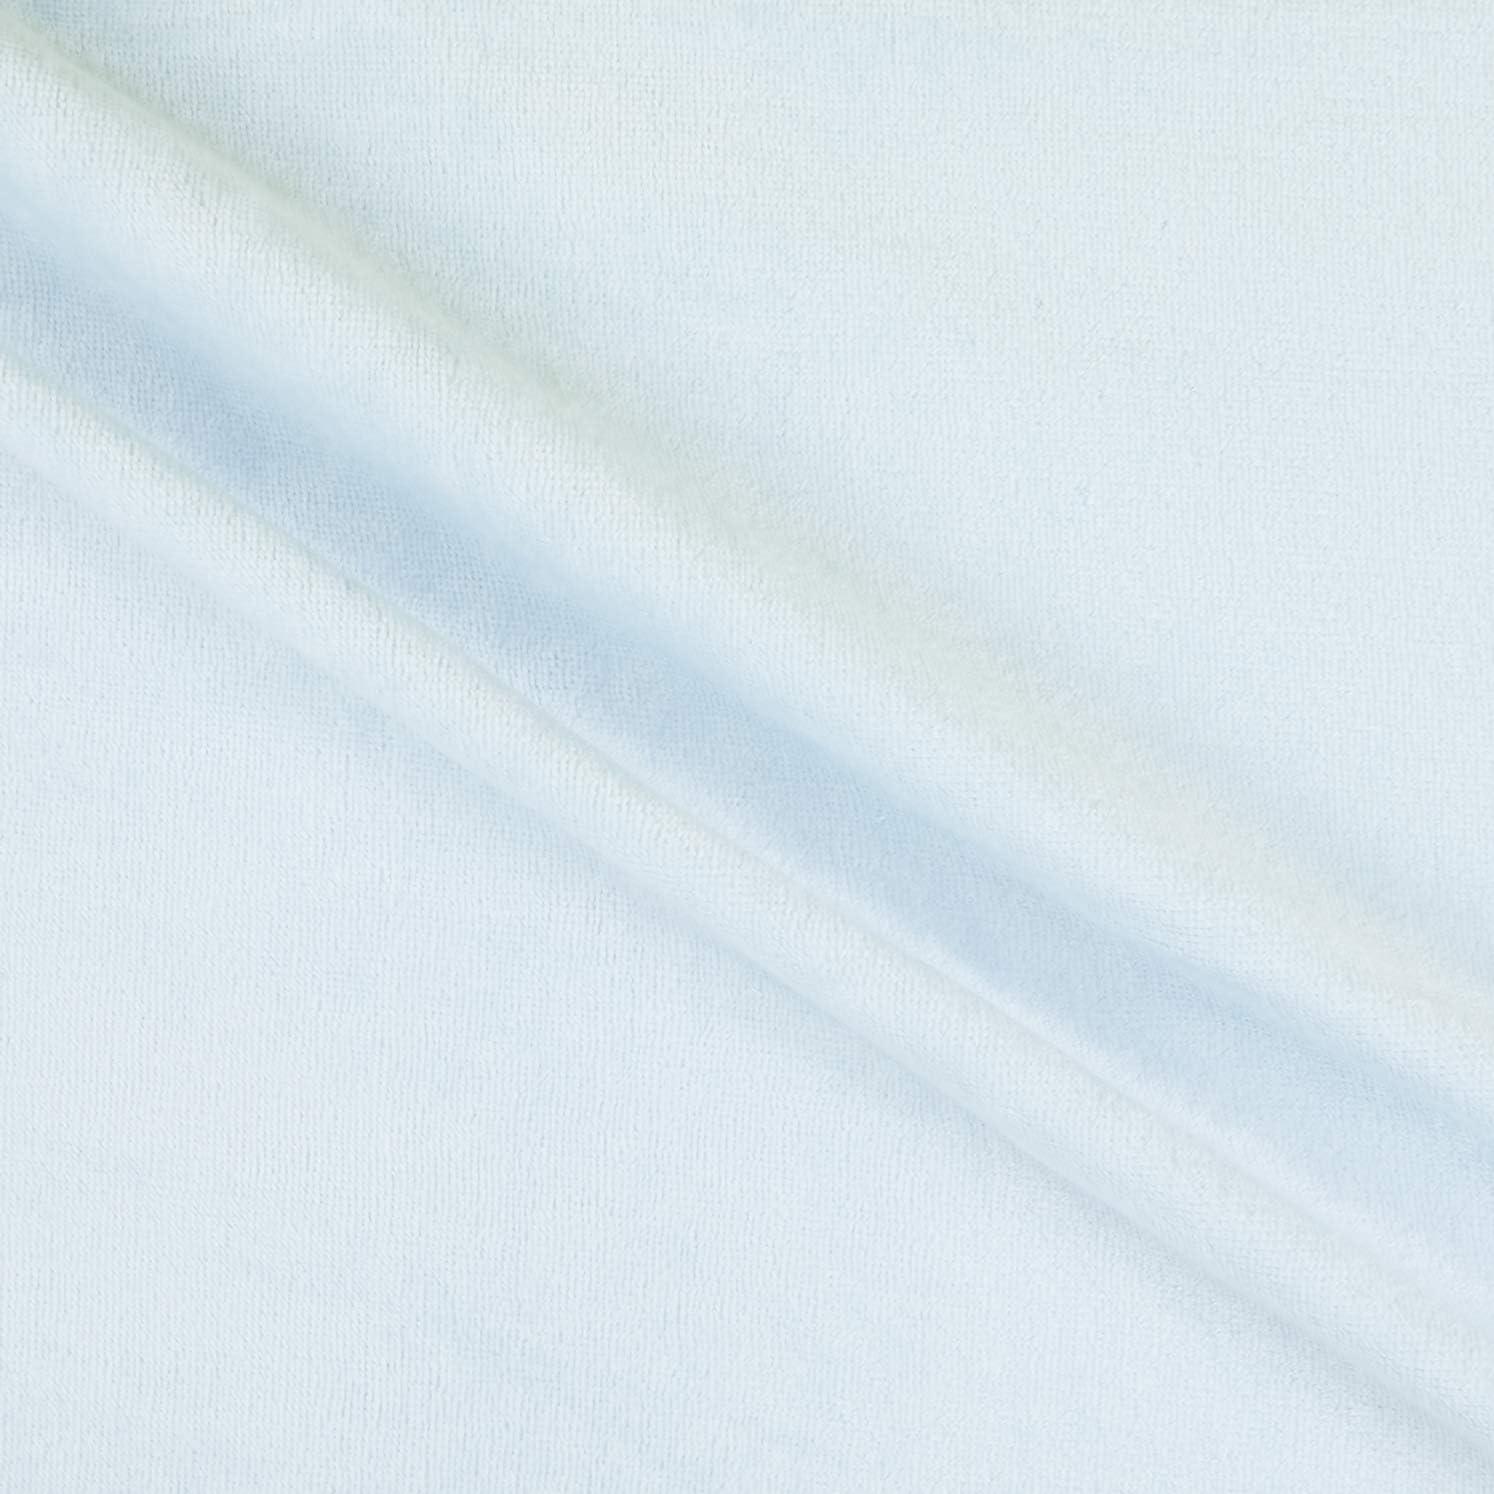 12 oz. Comfort Terry Velour Light Yard 10 Bolt Max 60% OFF Blue Many popular brands